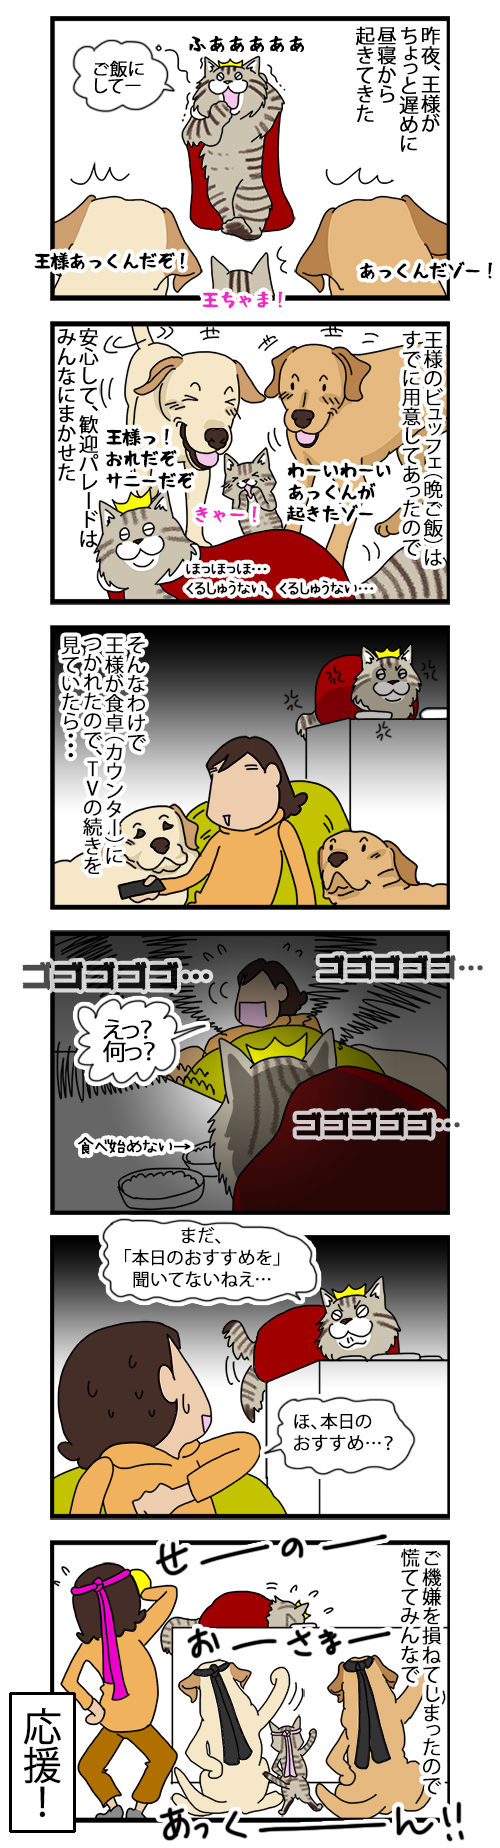 23062020_dogcomic.jpg